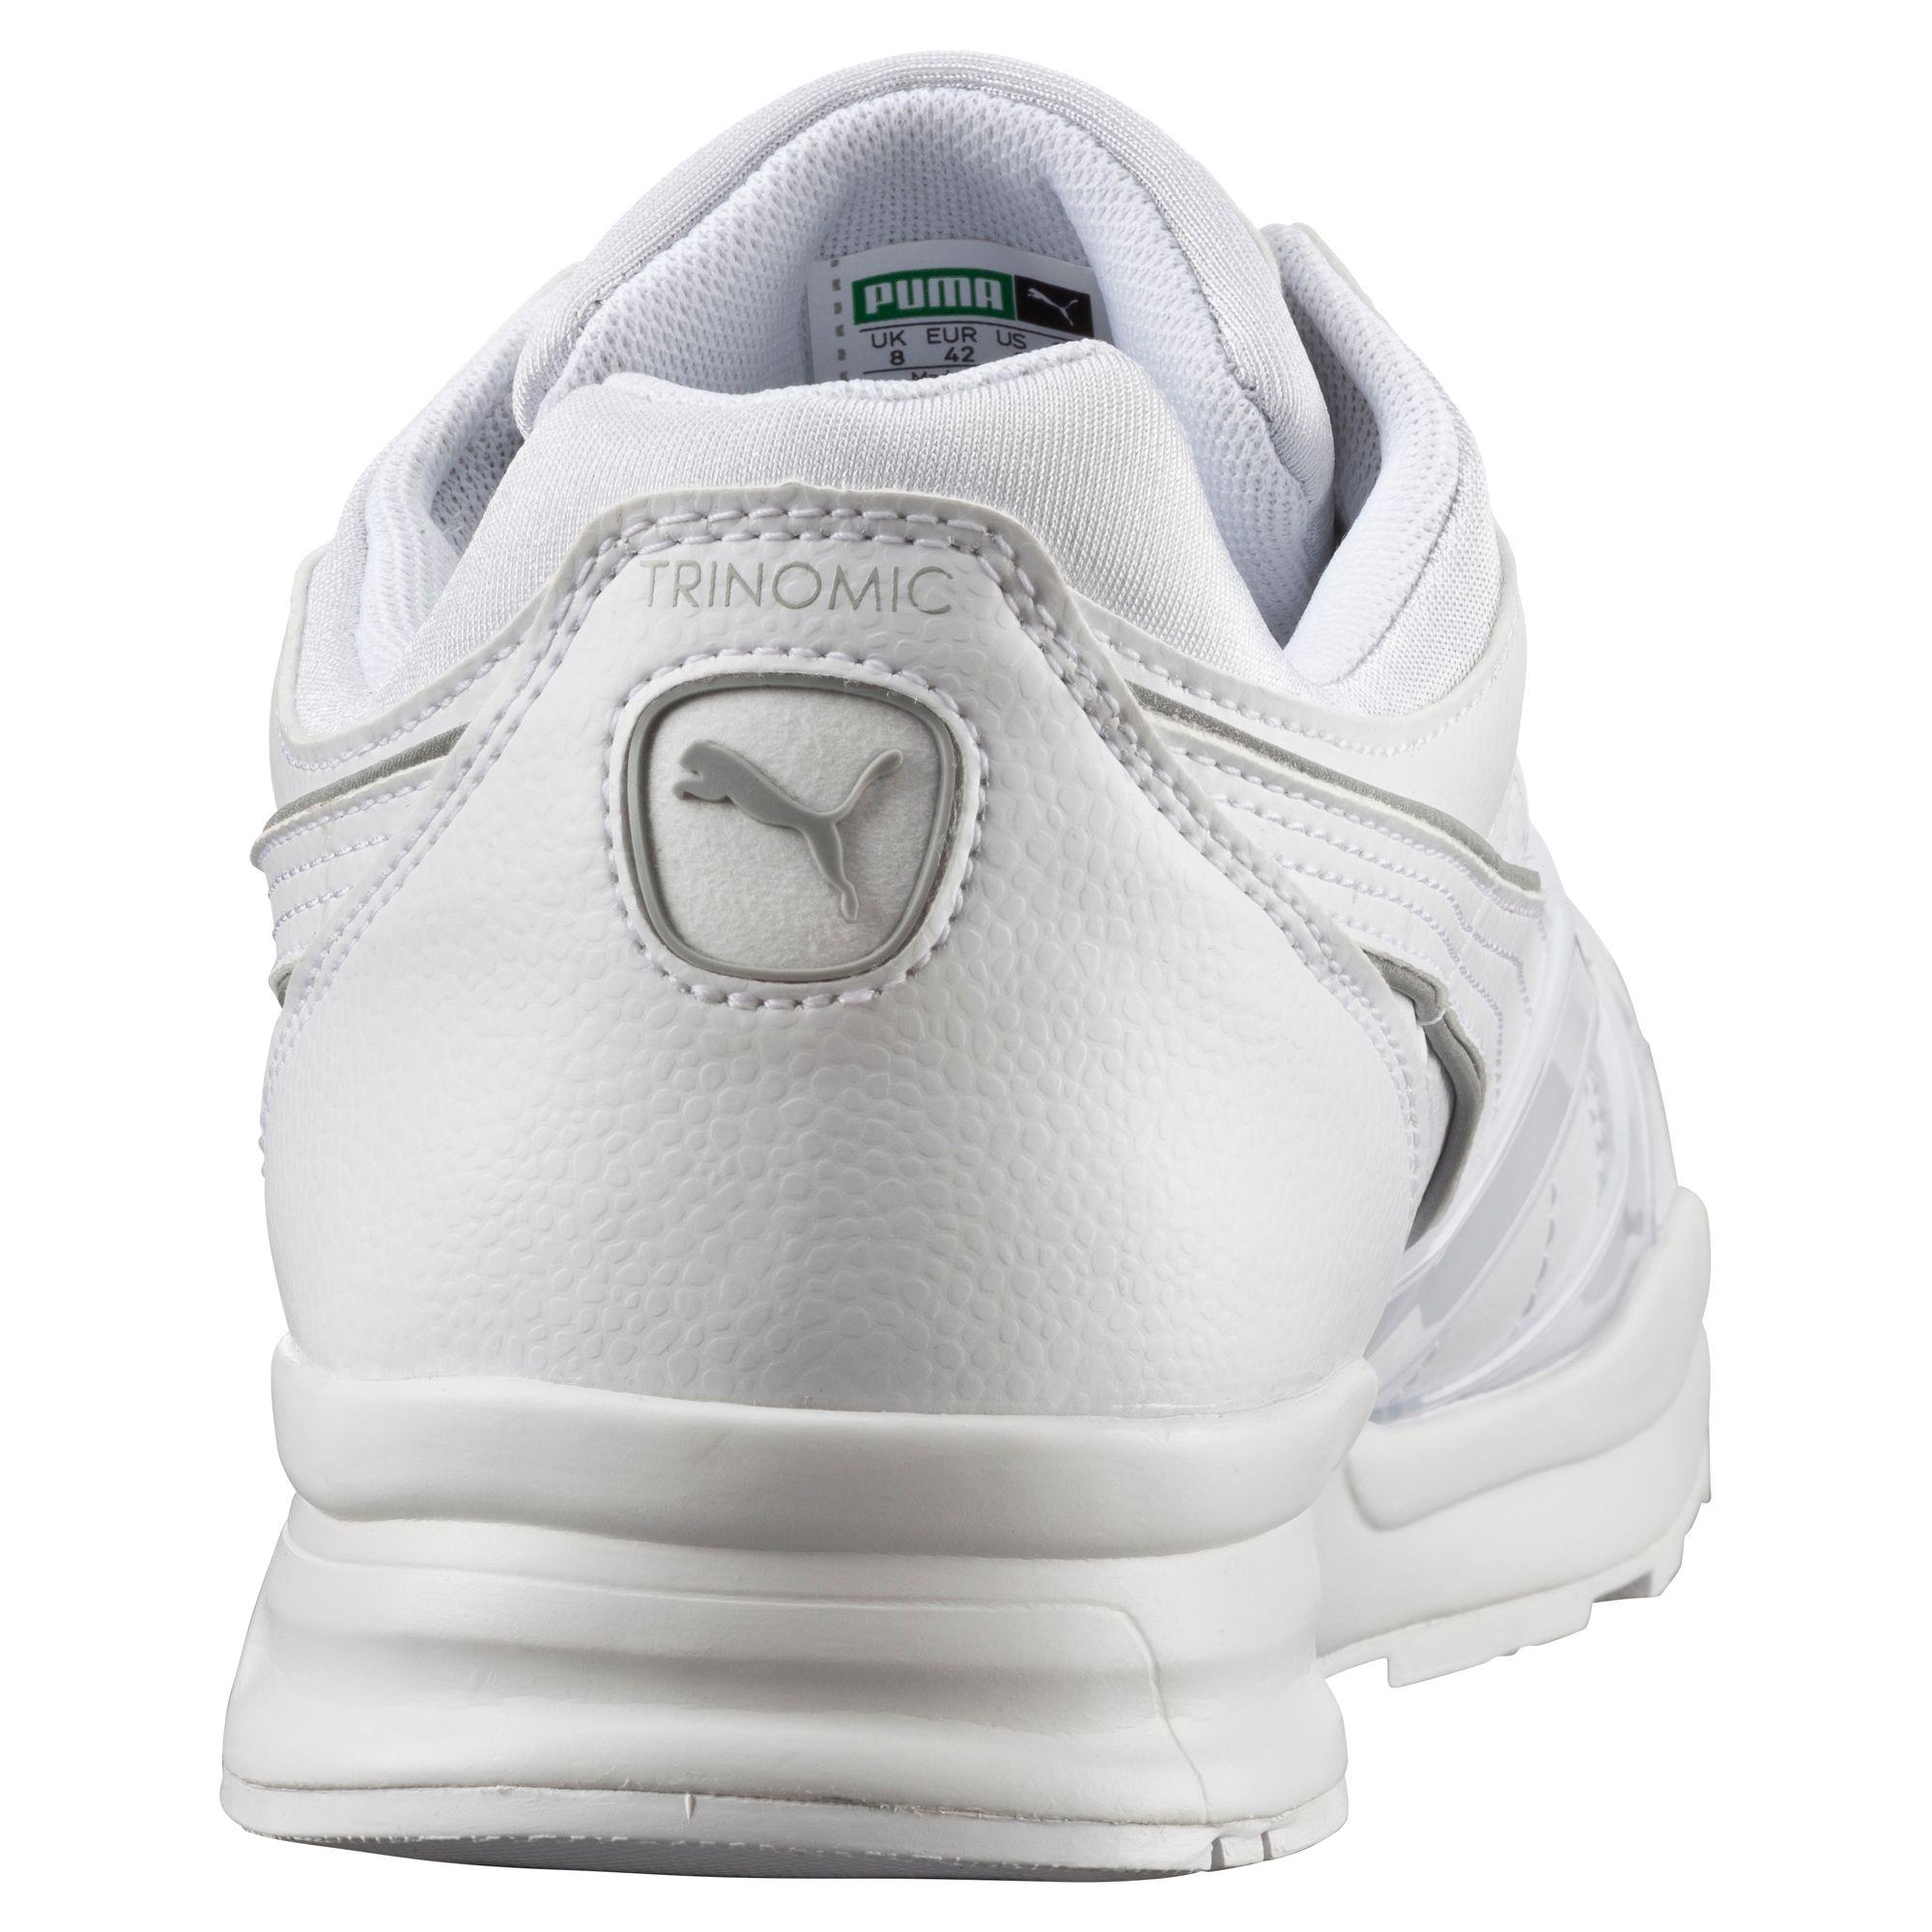 f4ed7b14e075 PUMA Trinomic XT-1 Reflectriple Trainers Footwear Sneakers Sport ...